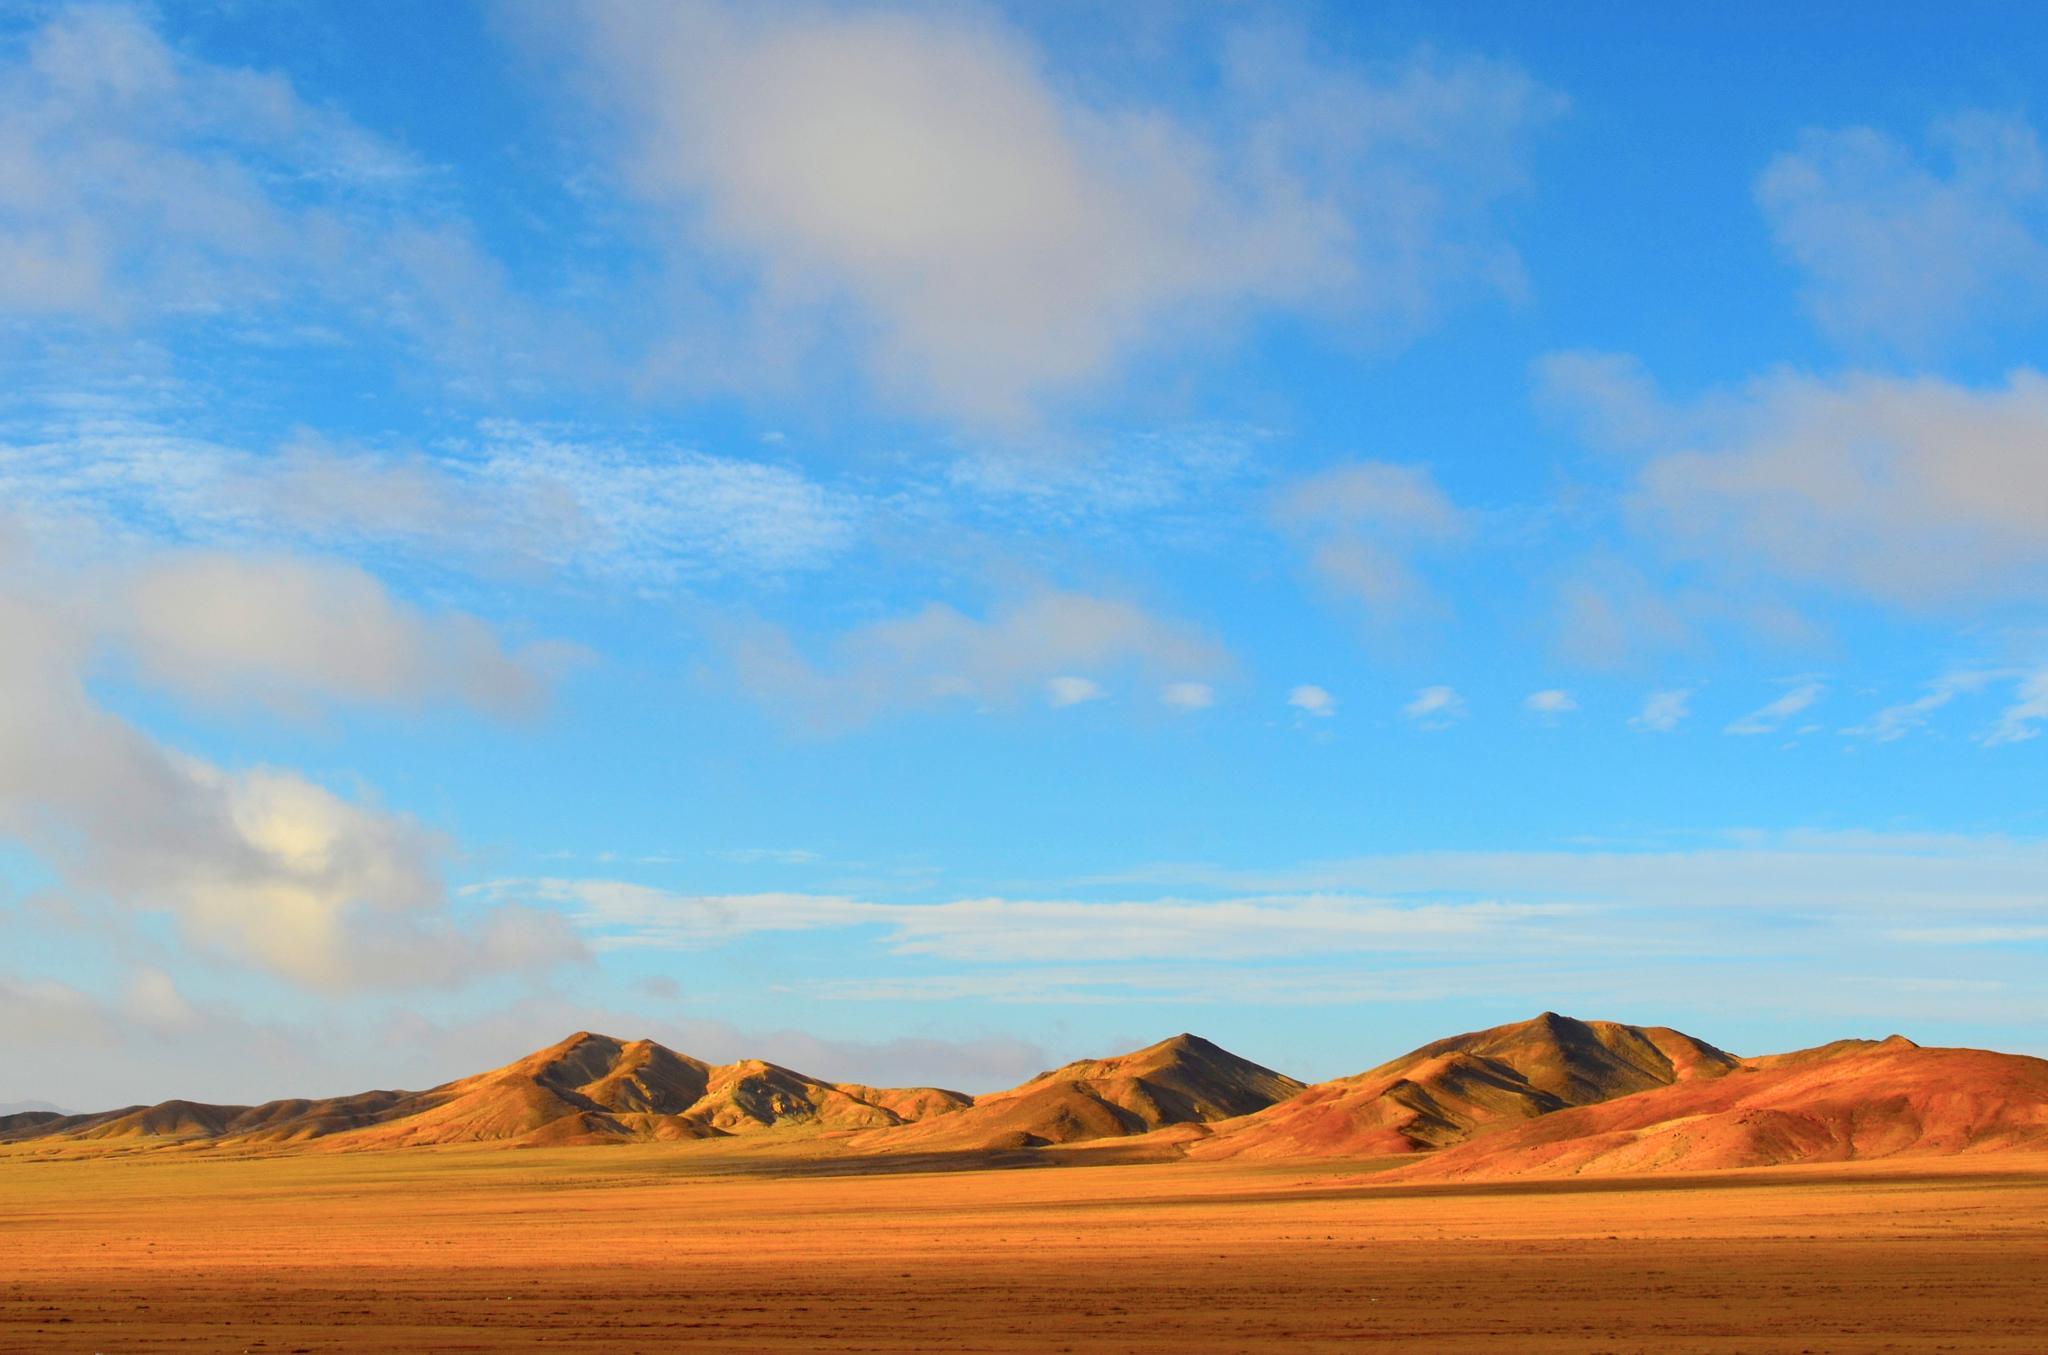 The Atacama Desert by Fernanda Medina Sáez